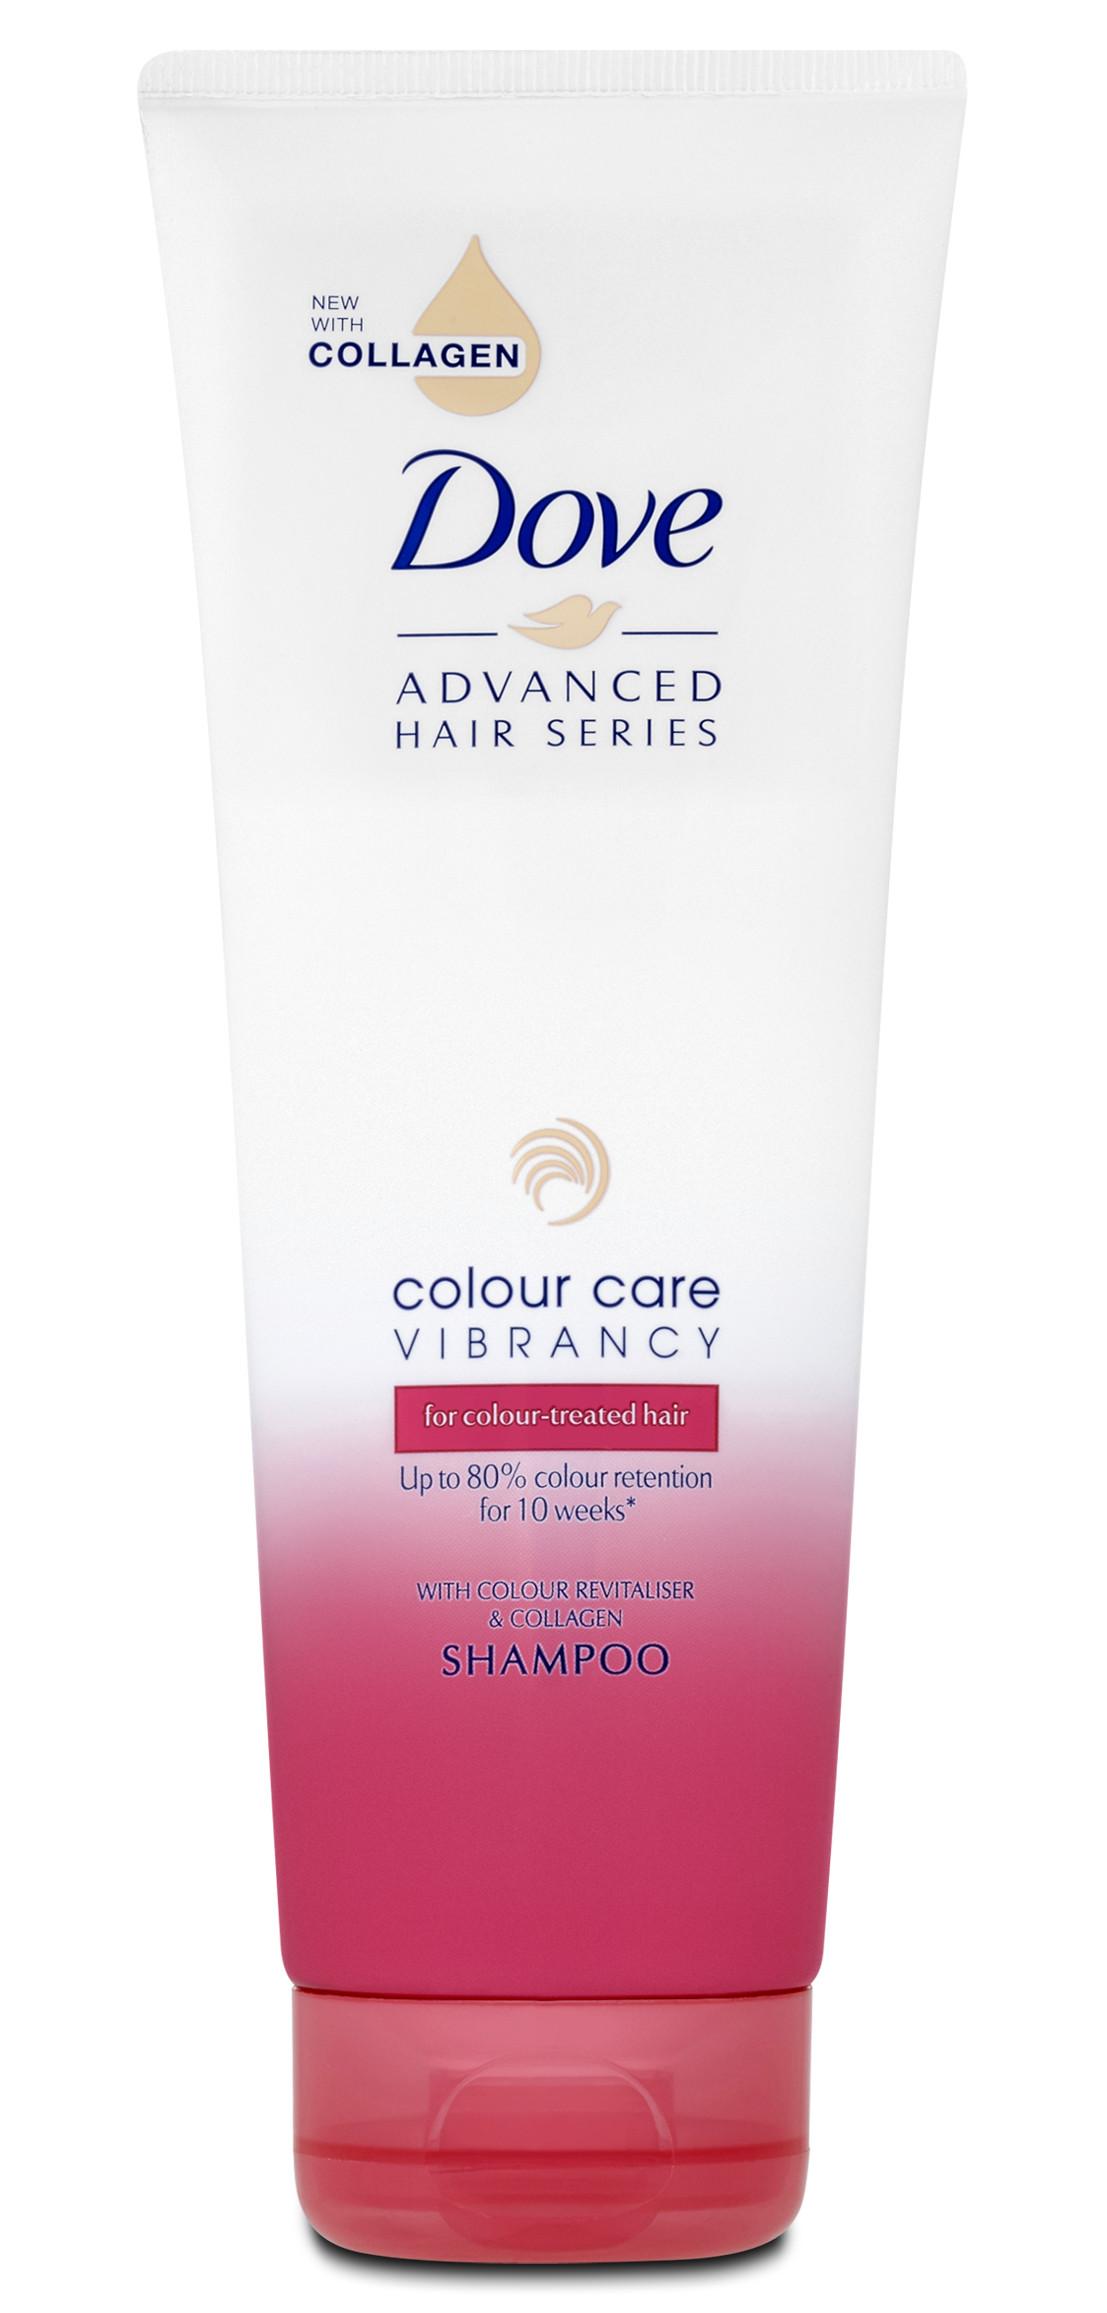 Šampon pro barvené vlasy Dove Advanced Colour Care Vibrancy - 250 ml (67263883)